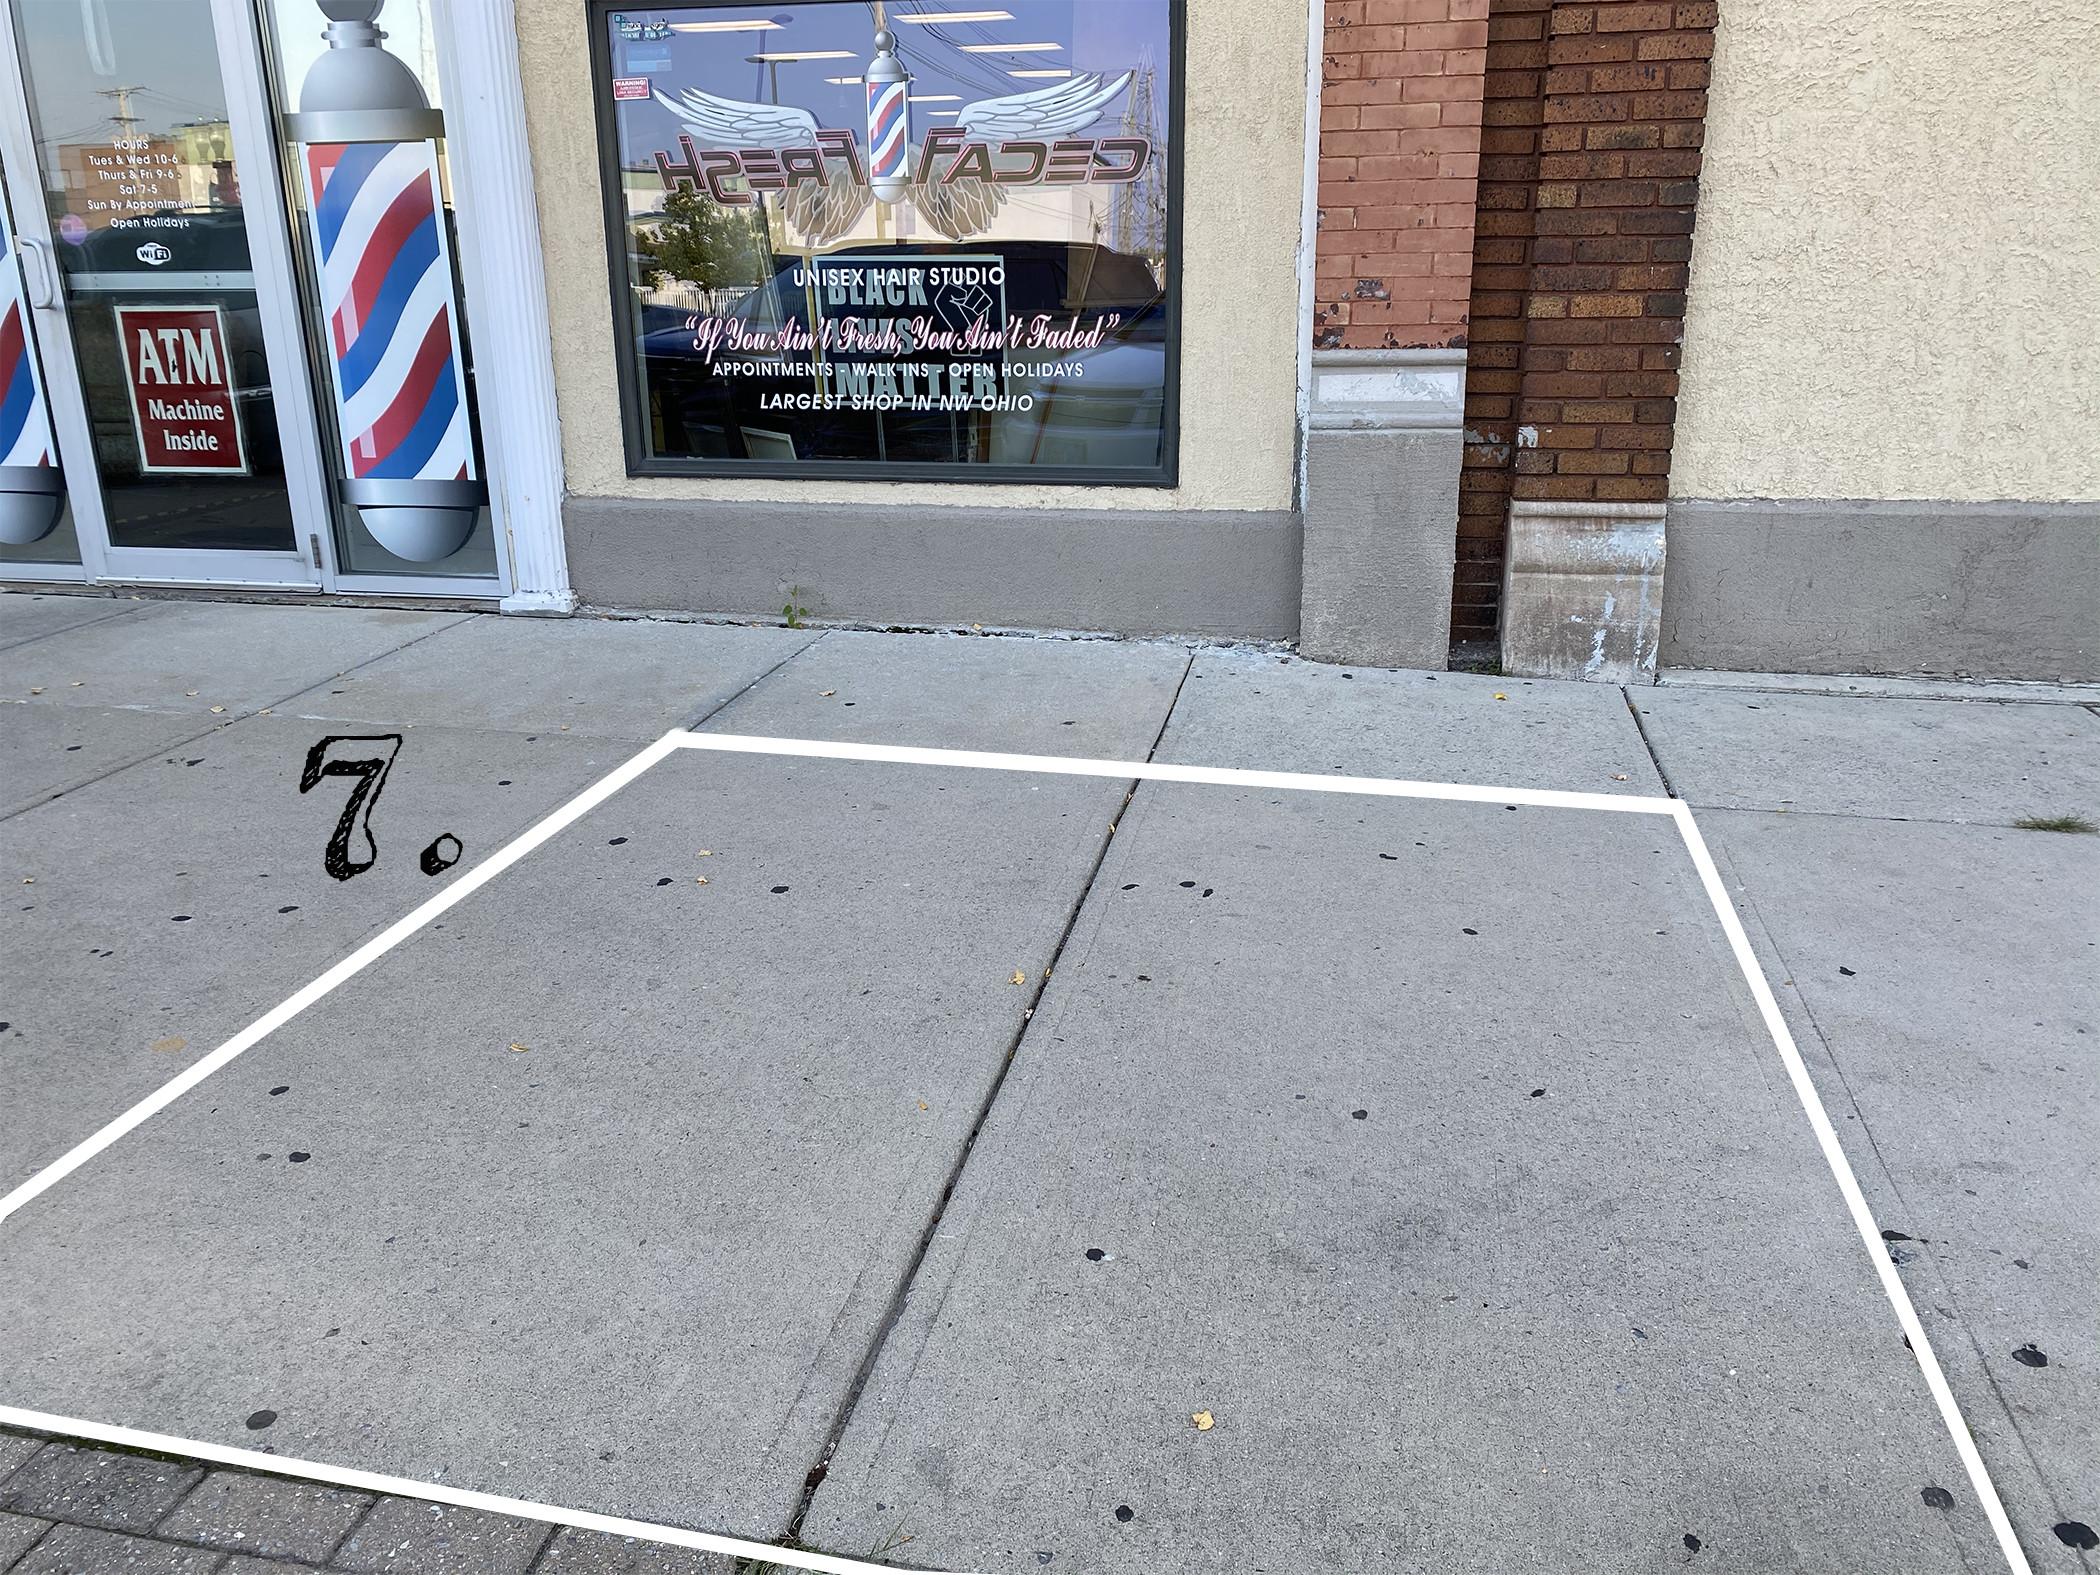 #7: 227 S. Main Street